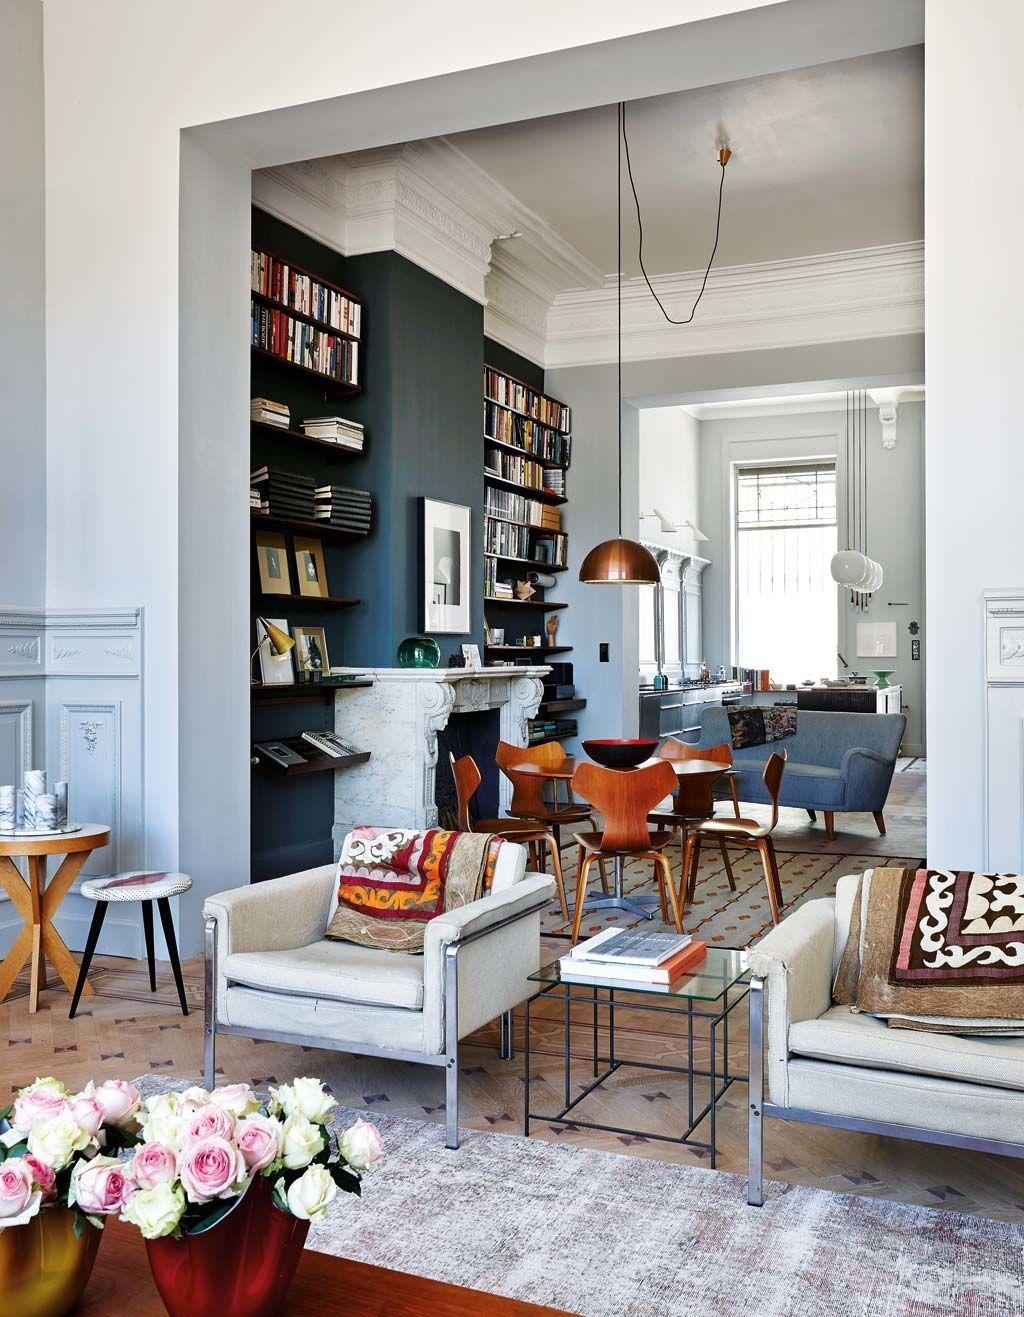 Chesterfield einrichtungsstil modern  LIBERTYN interiors | Interior Design | Pinterest | Interiors ...